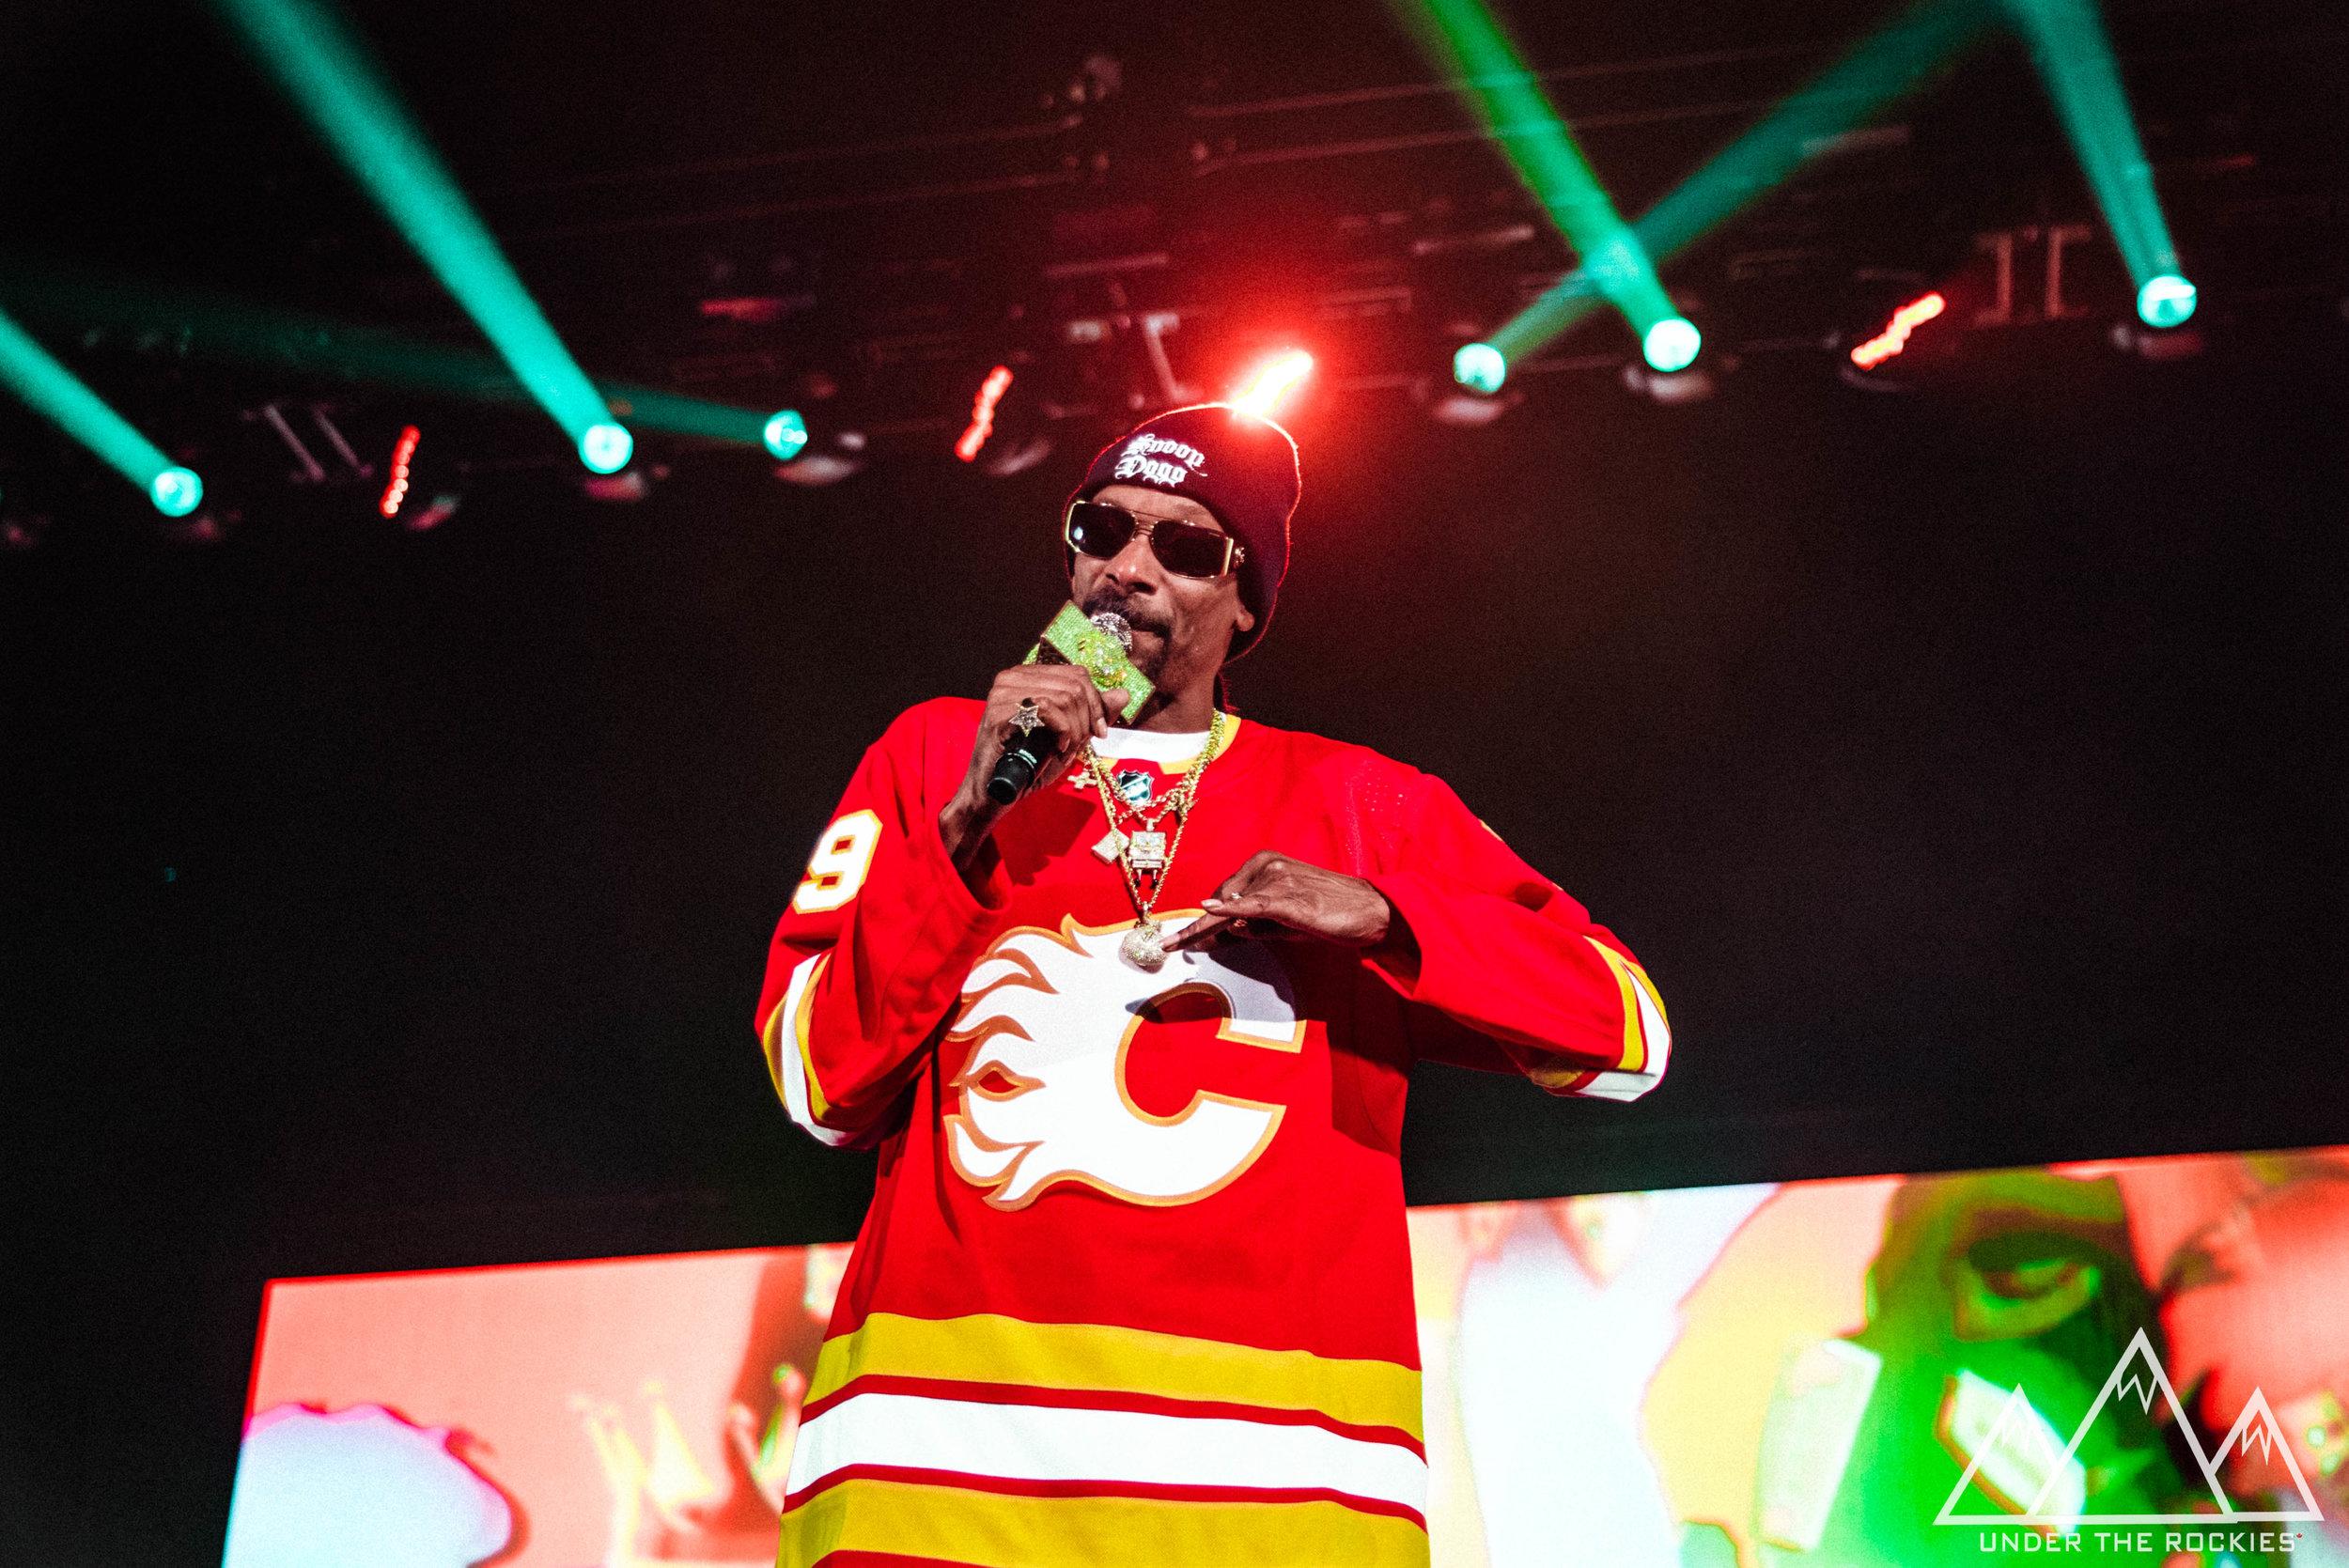 SnoopDogg-22-JJP-20190221.jpg